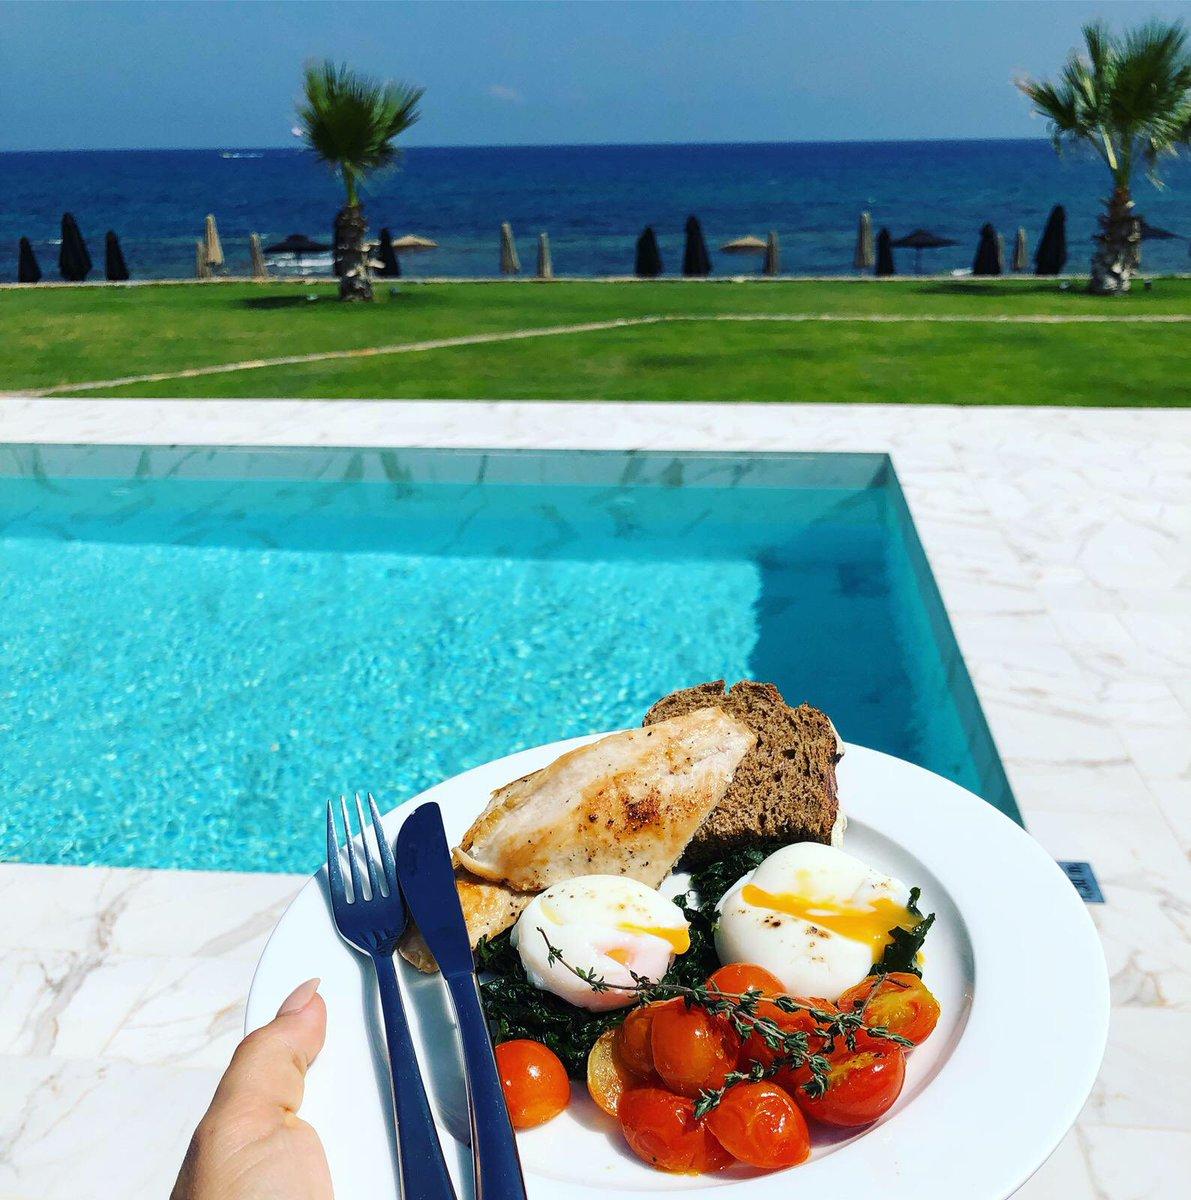 Breakfast with a view 😍 @abatonisland